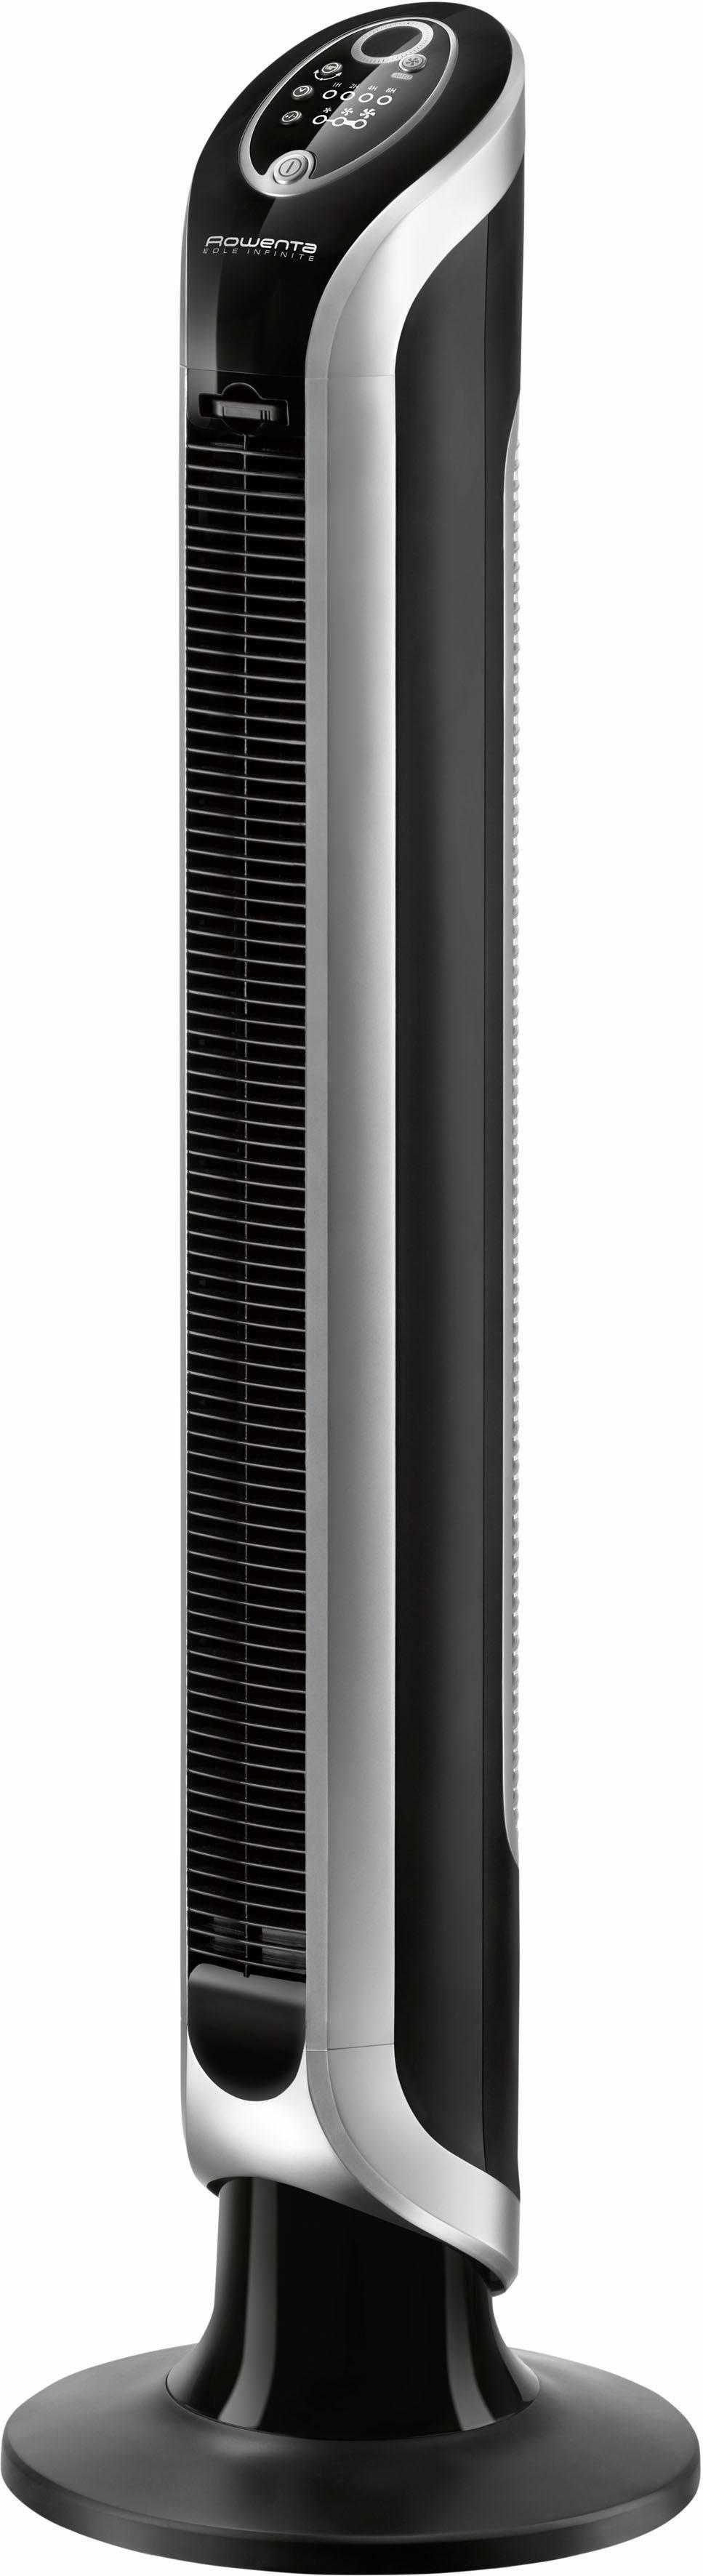 Rowenta Turmventilator VU 6670F0 EOLE INFINITE, leistungsfähiges Tangentialgebläse